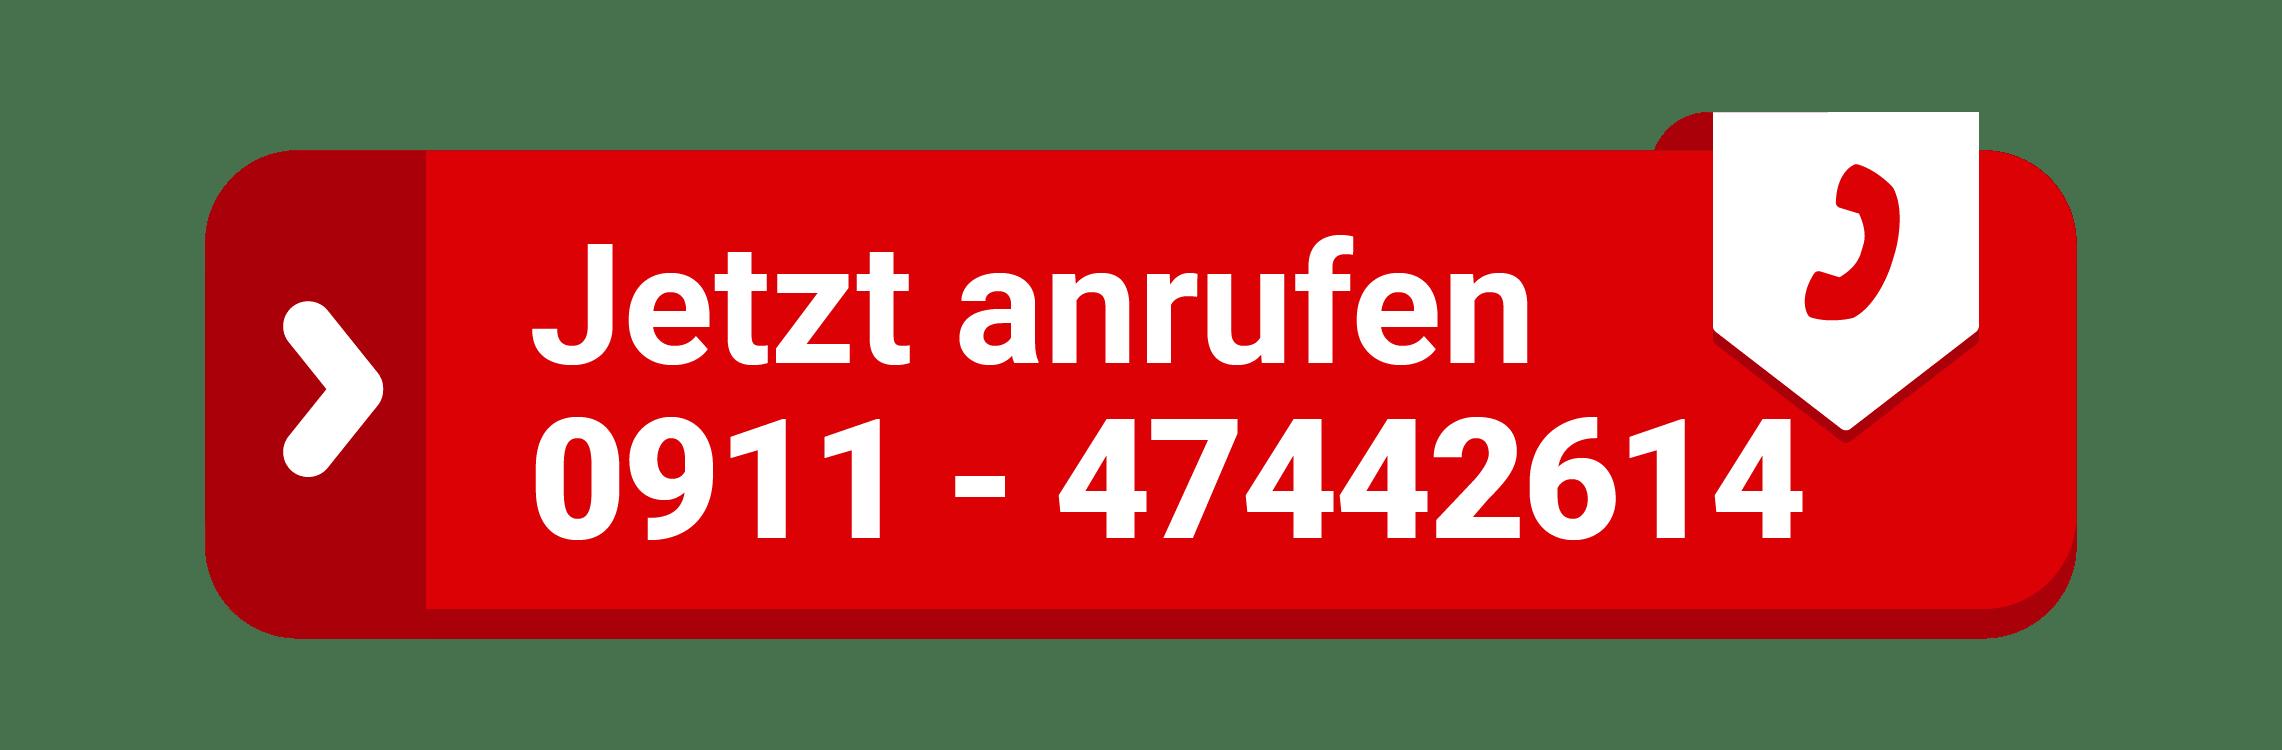 Telefonnummer-Autowerkstatt